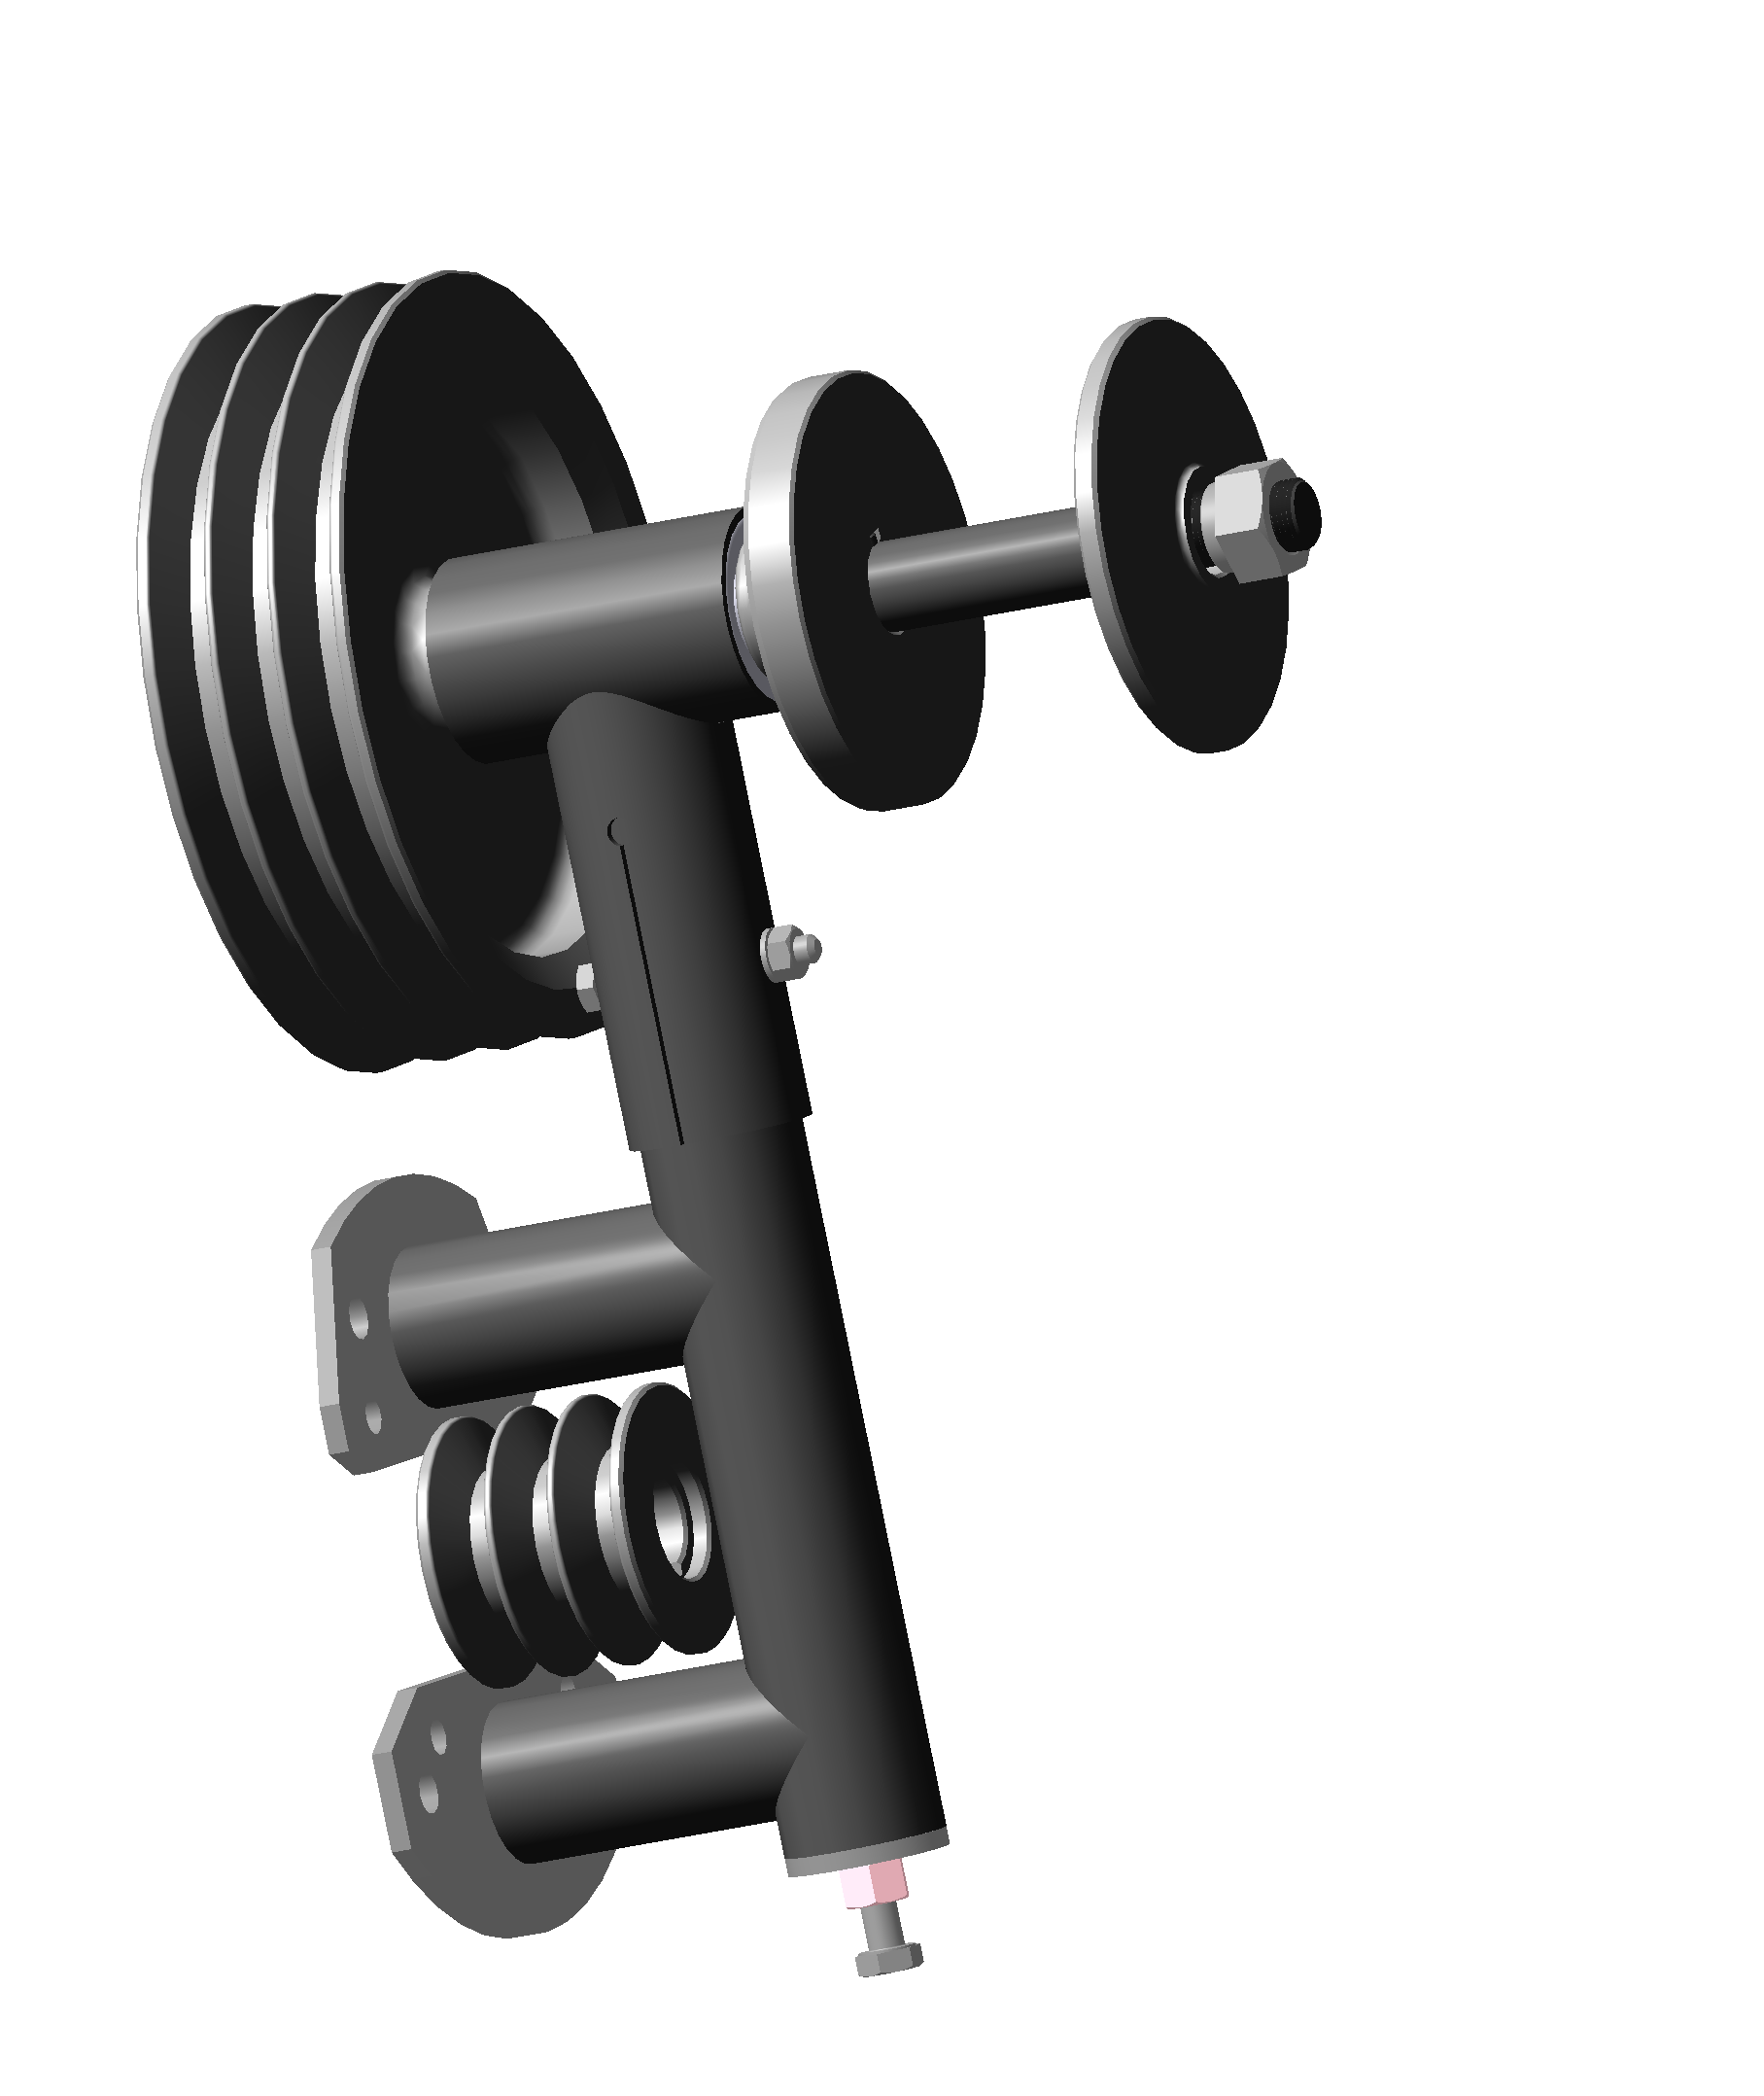 Drawings gearbox aero machine Lifan190 - Lifan192 2019